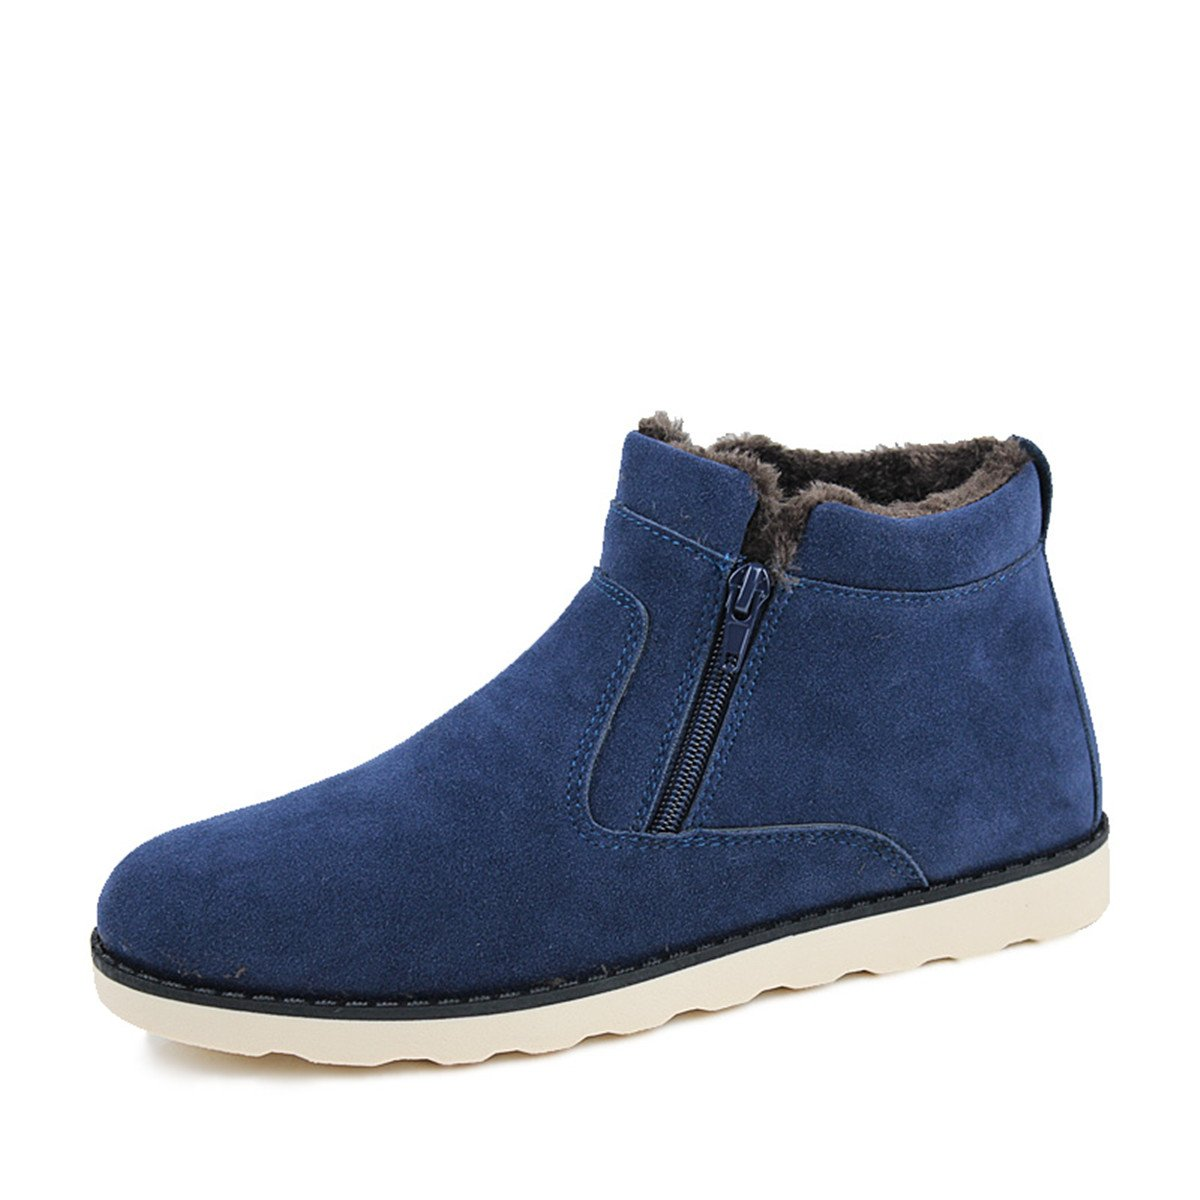 da39e35672f5c Boots Snow Sneakers Men Women Shoes Outdoor Winter Ankle Fur Lined ...